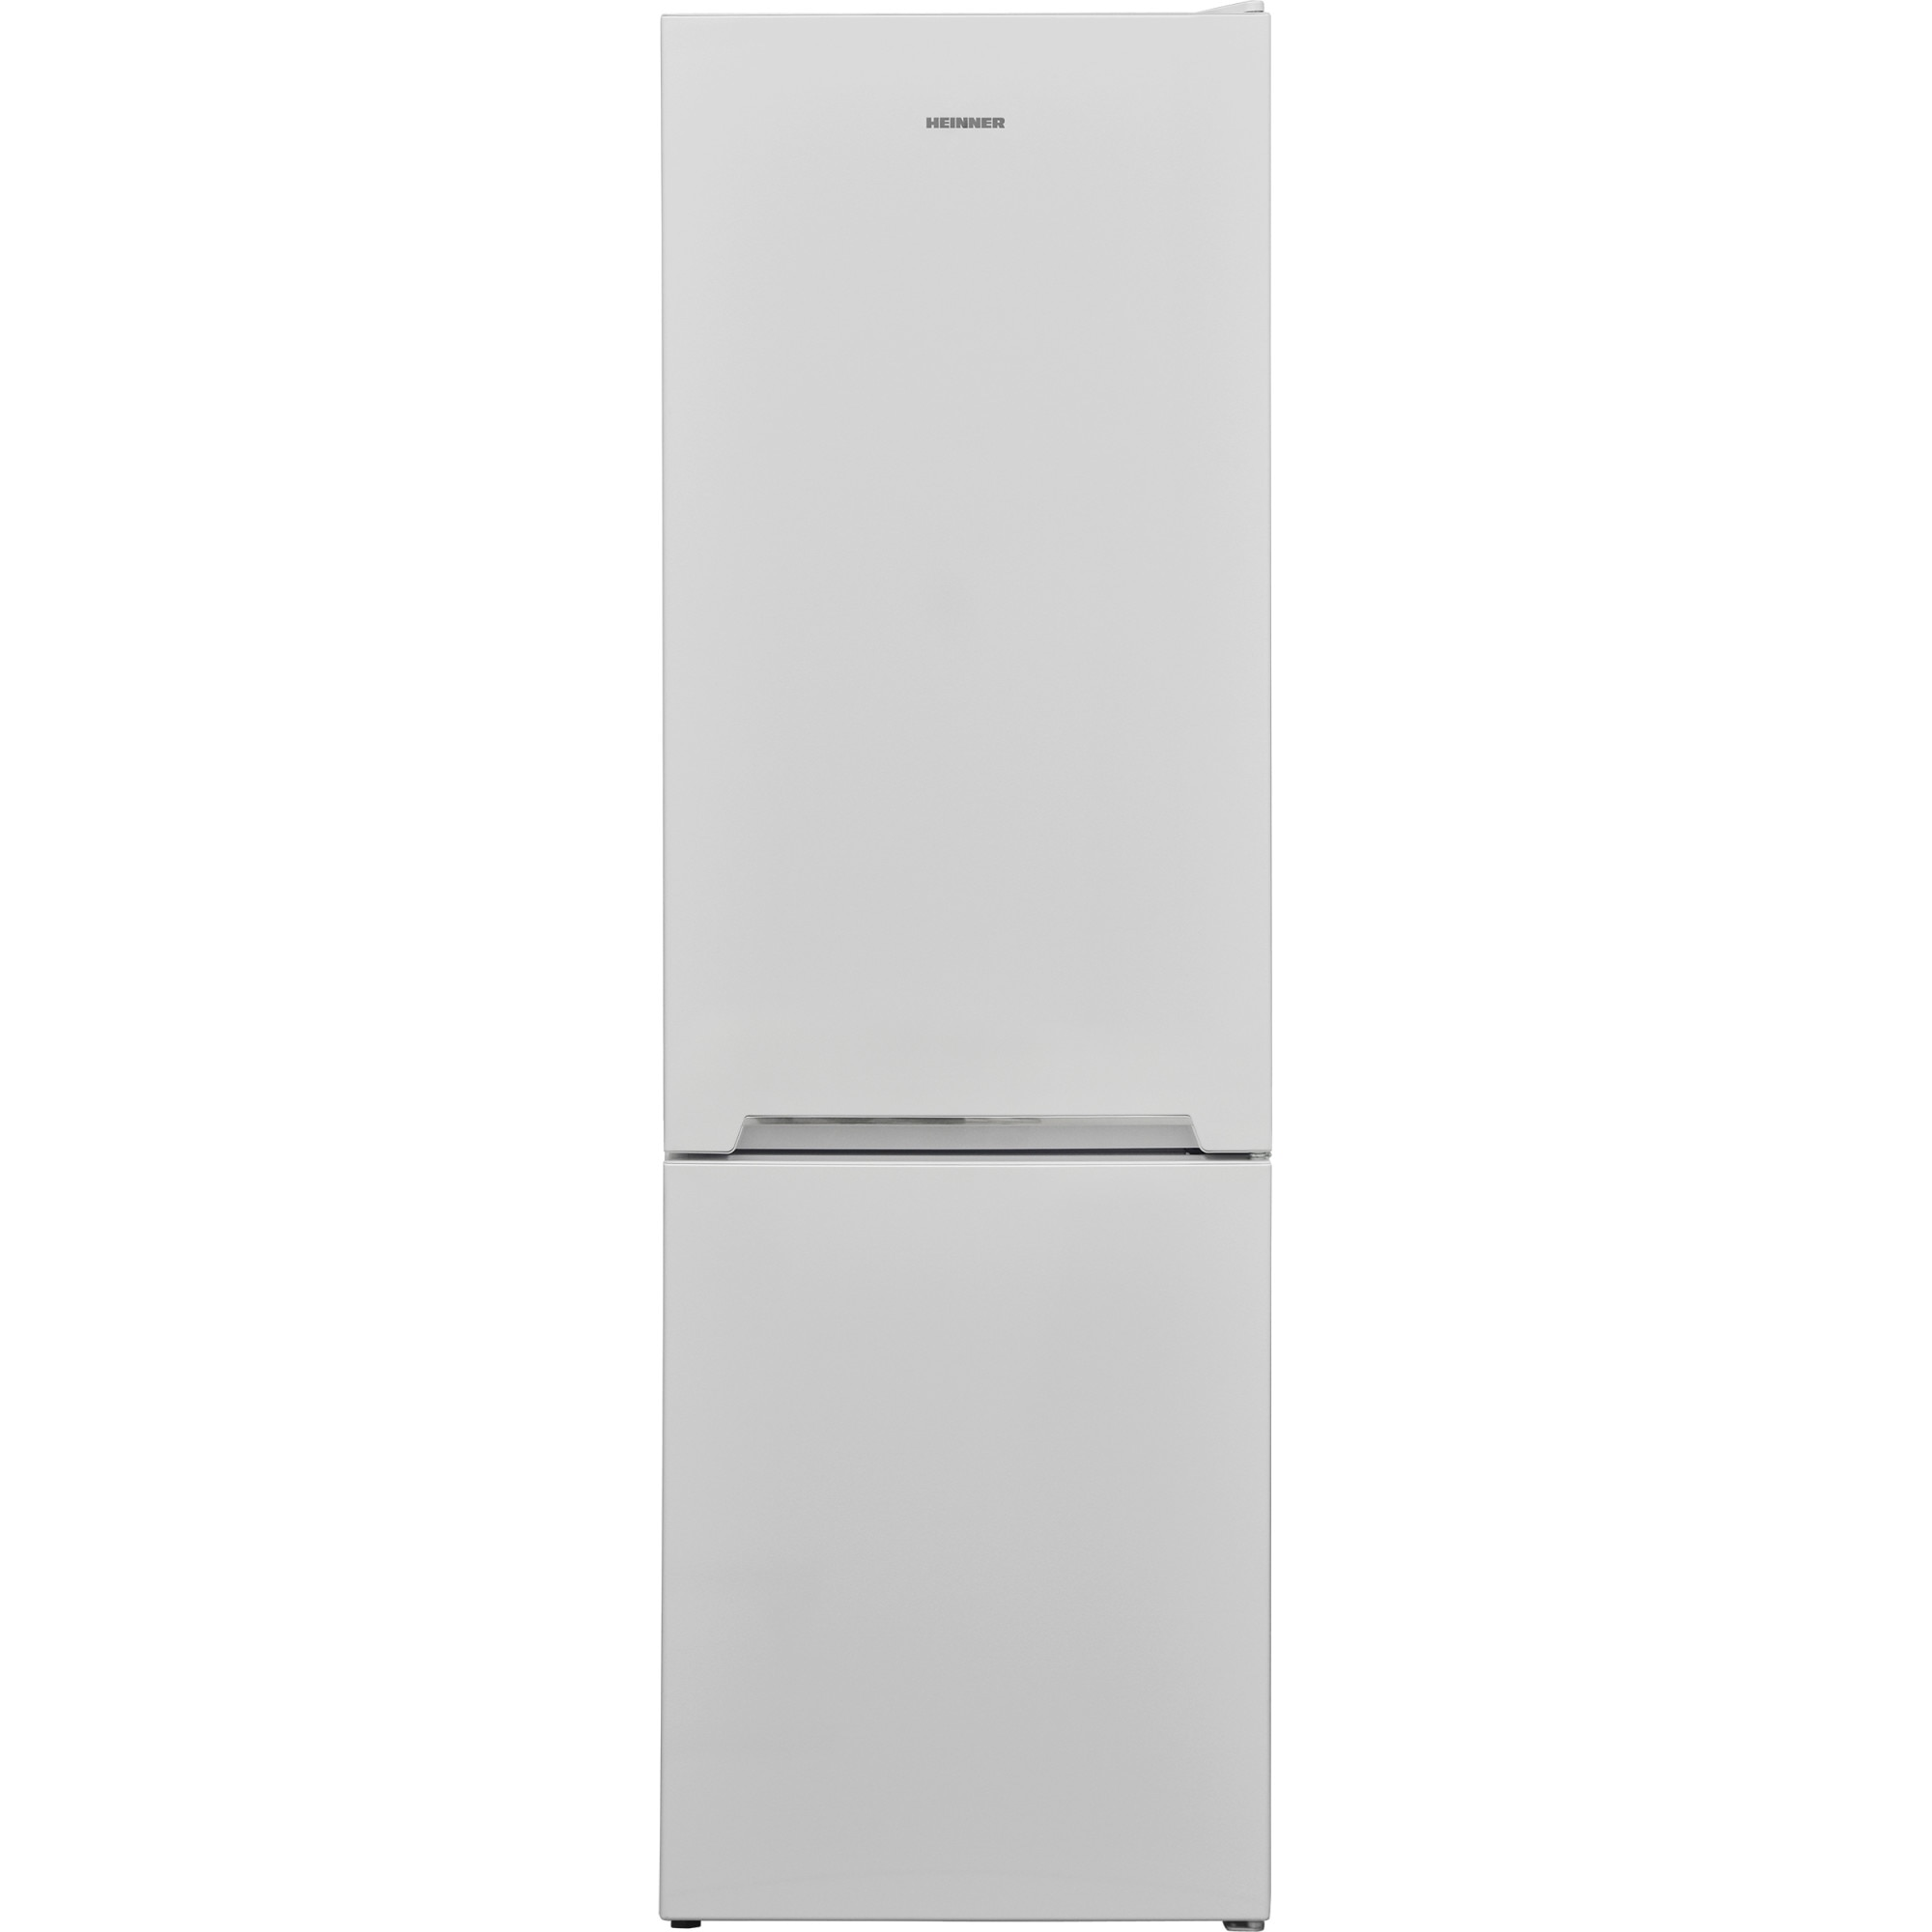 Fotografie Combina frigorifica Heinner HC-V268A+, 268 l, Clasa A+, H 170 cm, Control mecanic cu termostat ajustabil, Alb